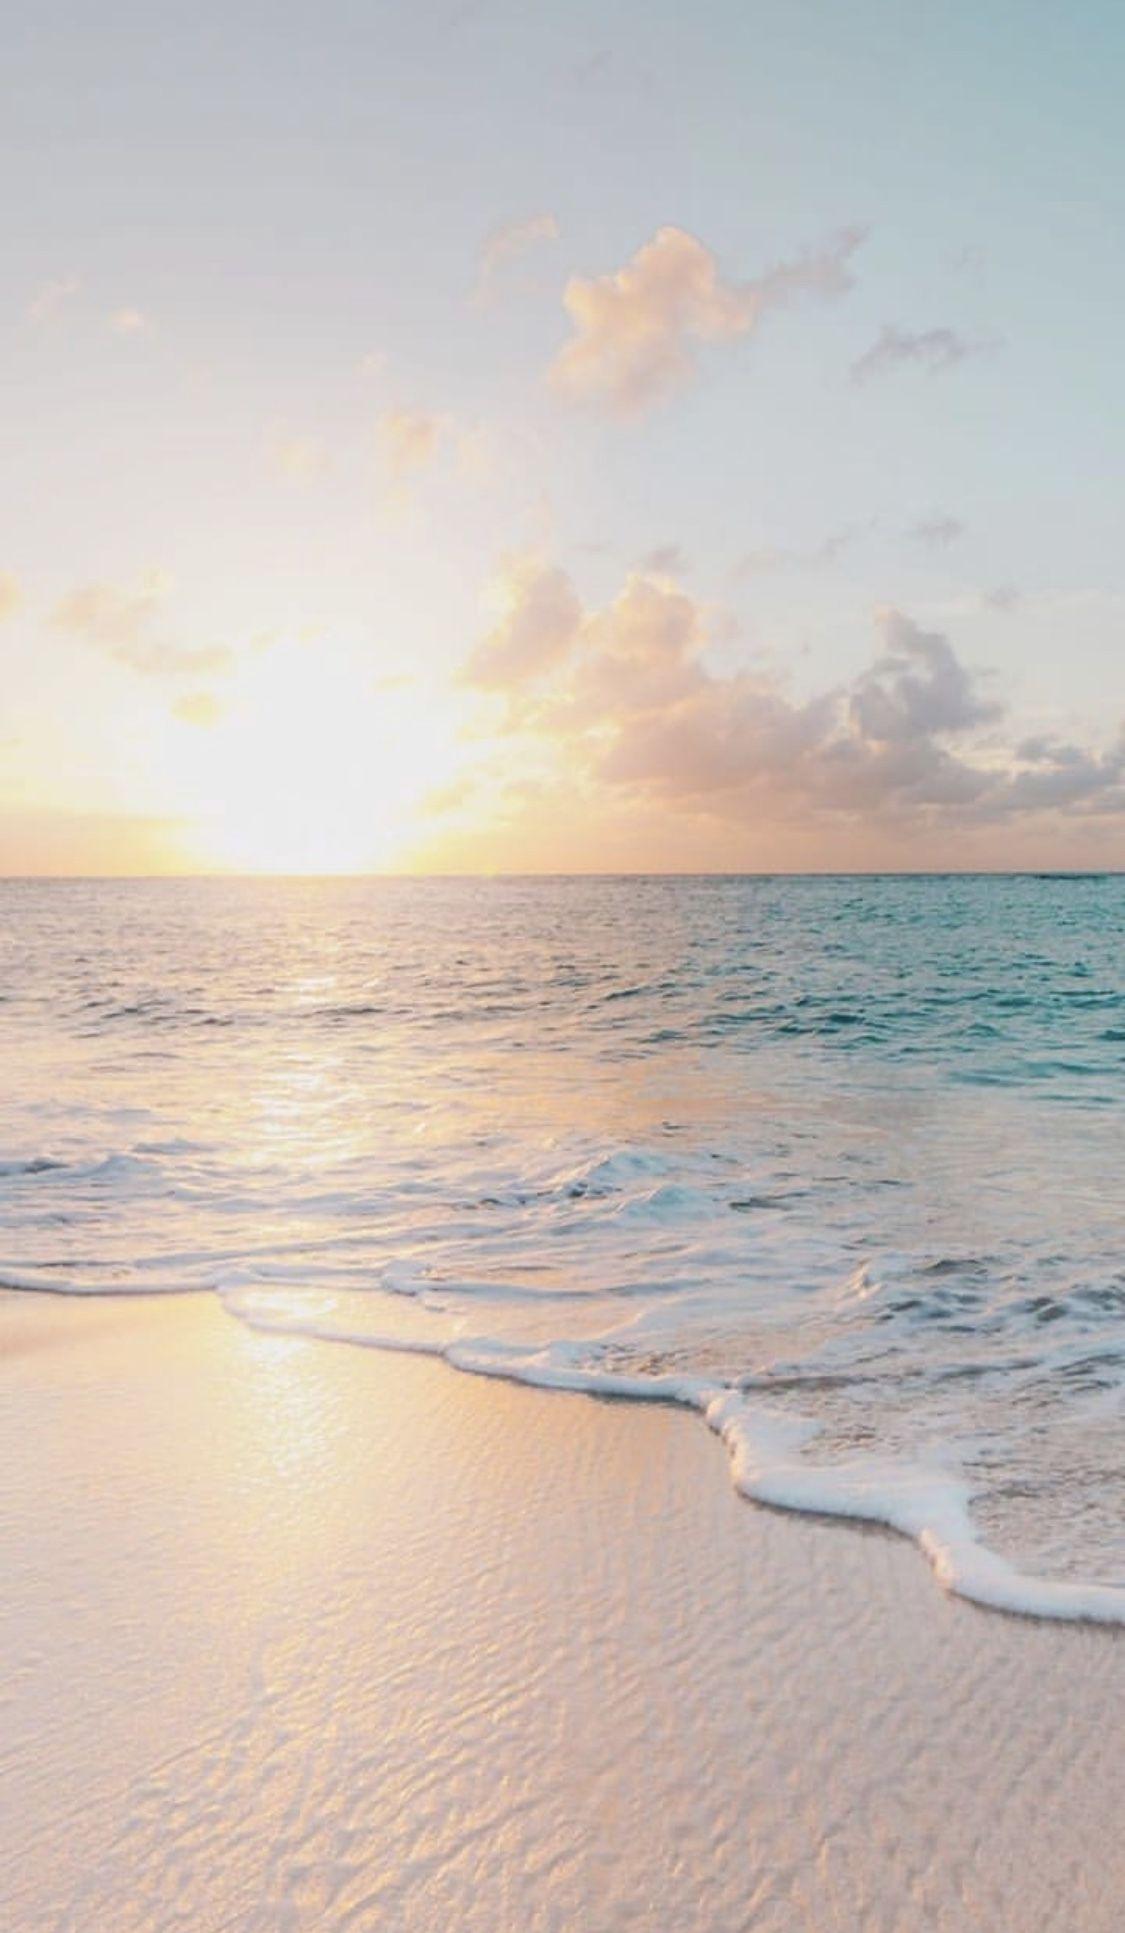 Wallpaper おしゃれまとめの人気アイデア Pinterest Laia Maynou 風景の壁紙 美しい風景写真 ビーチの壁紙